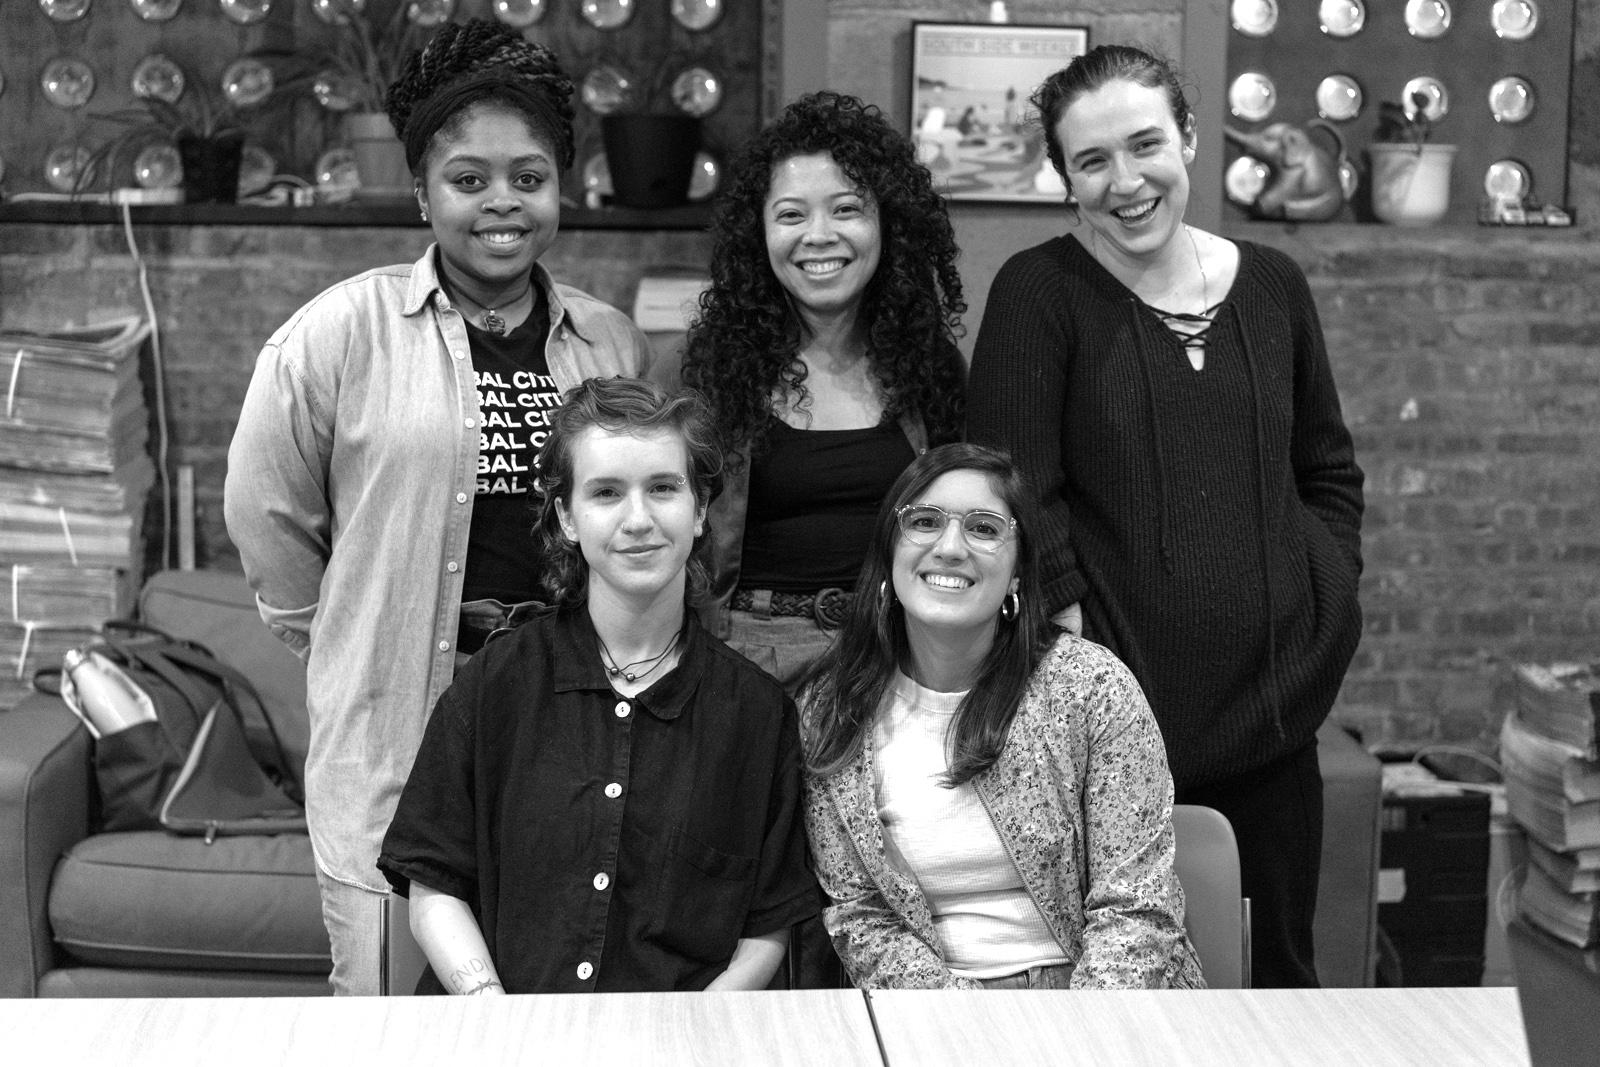 Team Maternal Health, clockwise from top left: Janaya Greene, Camille Powell, Sarah Conway, Caroline Olsen and Emeline Posner [Photo: Max Herman/City Bureau]